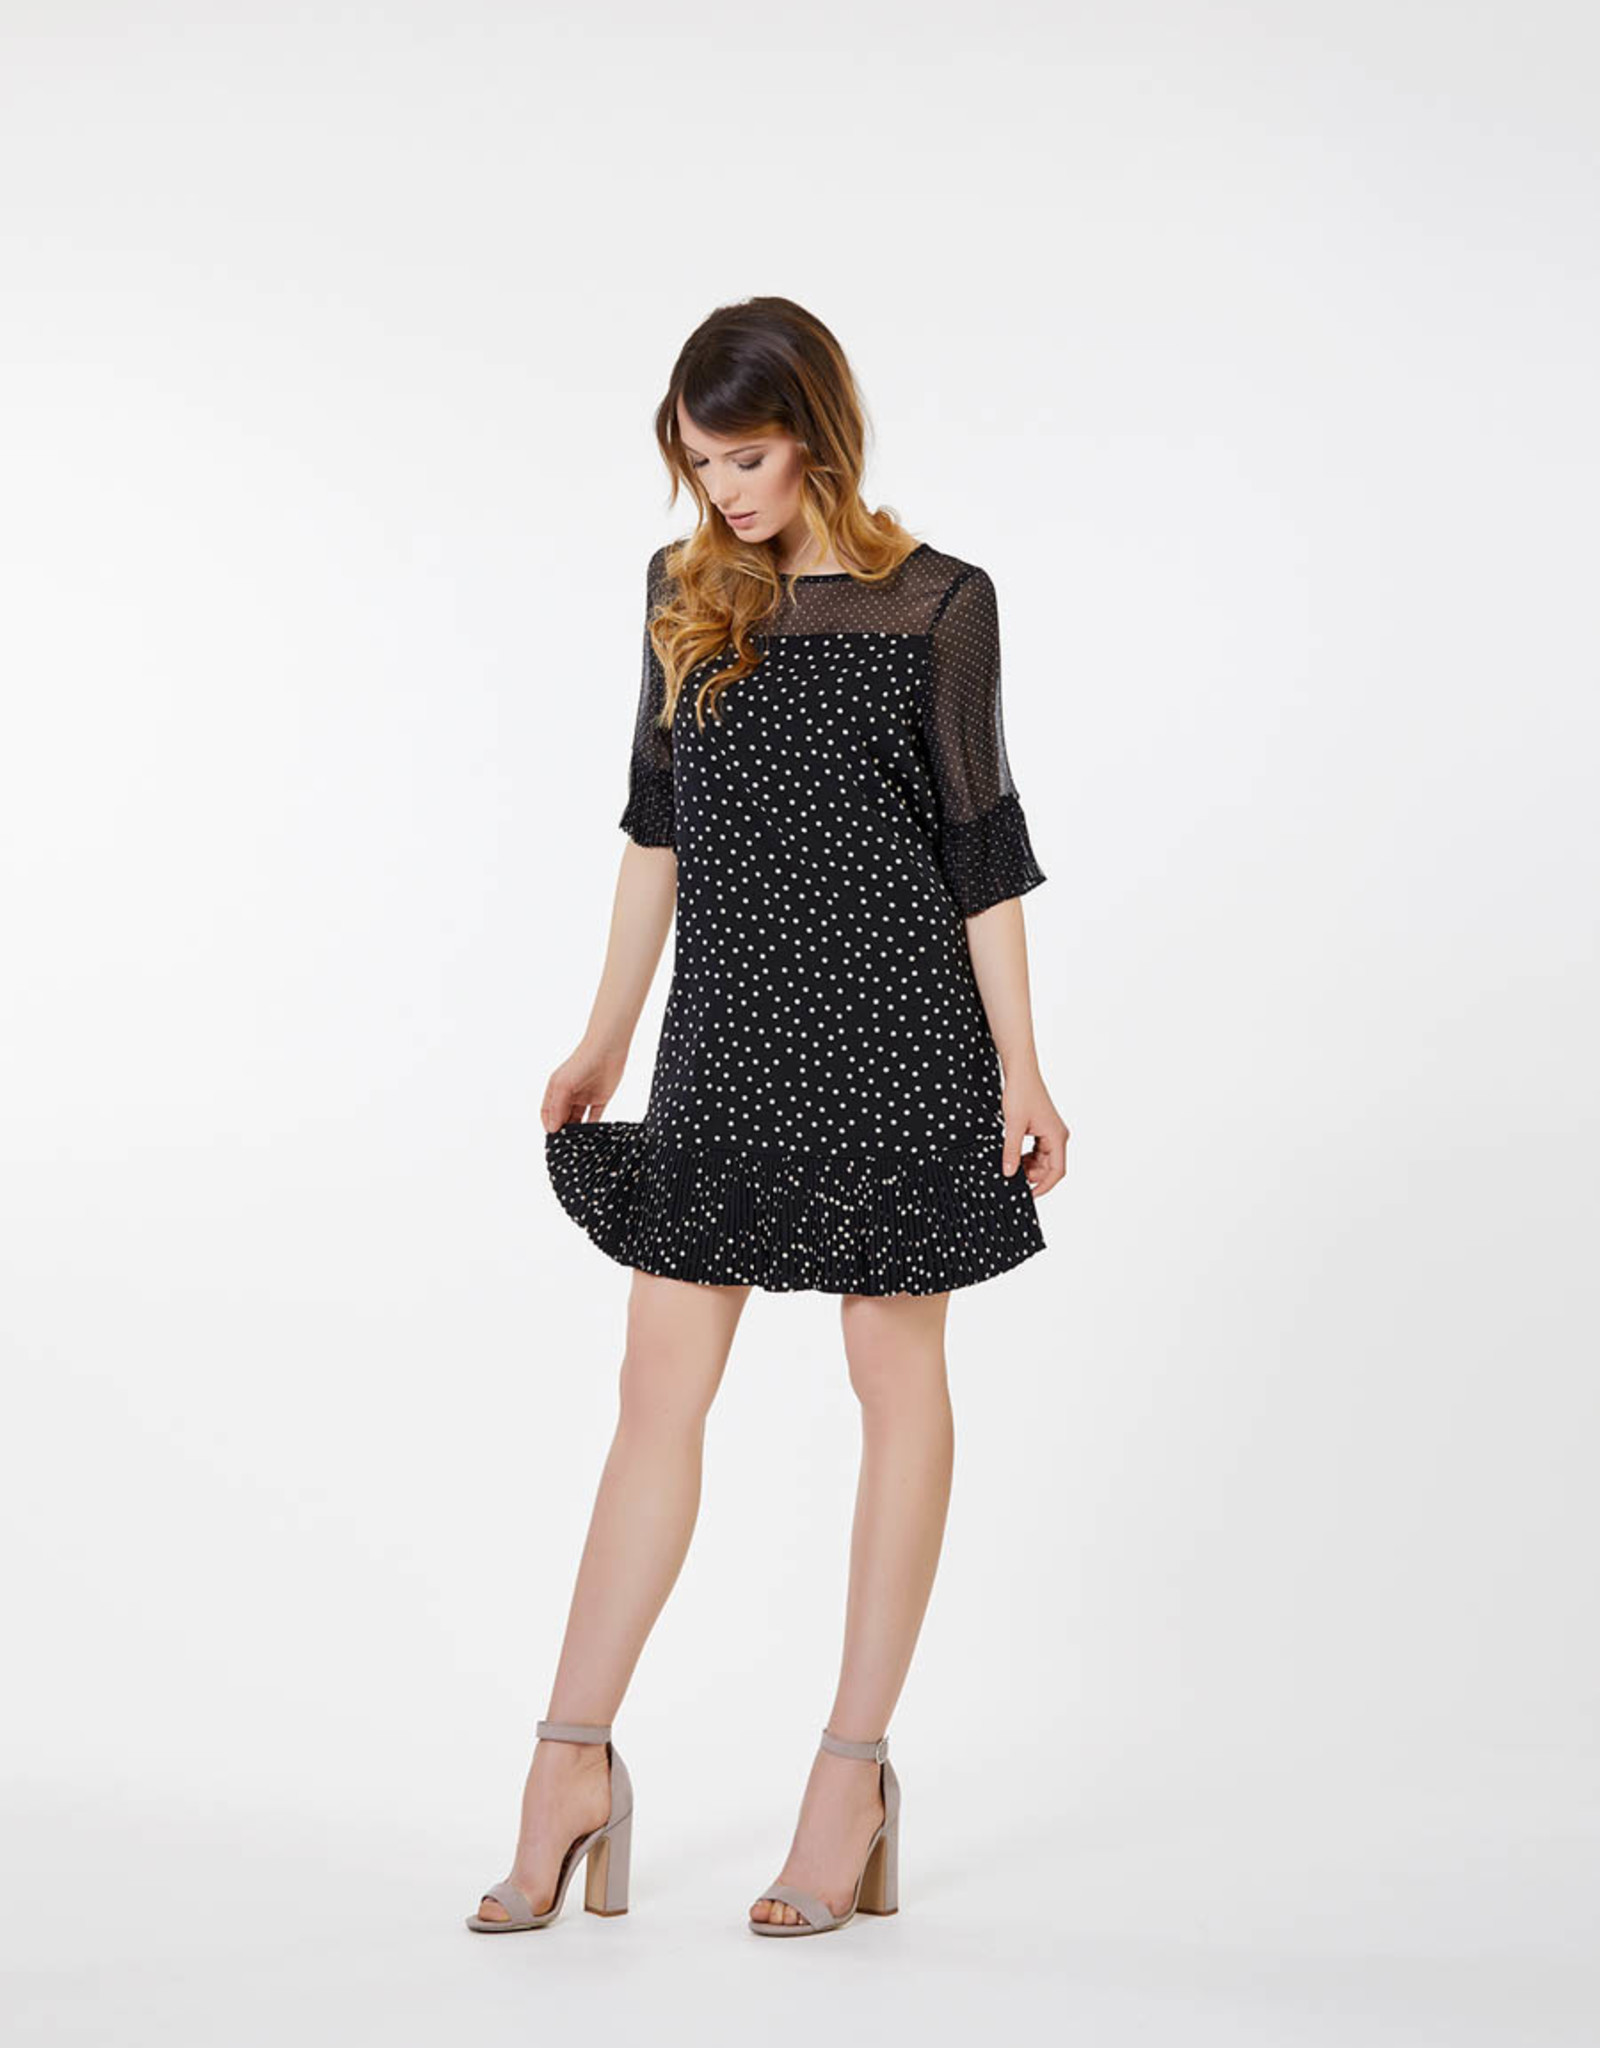 Dames Fashion zwarte jurk met print